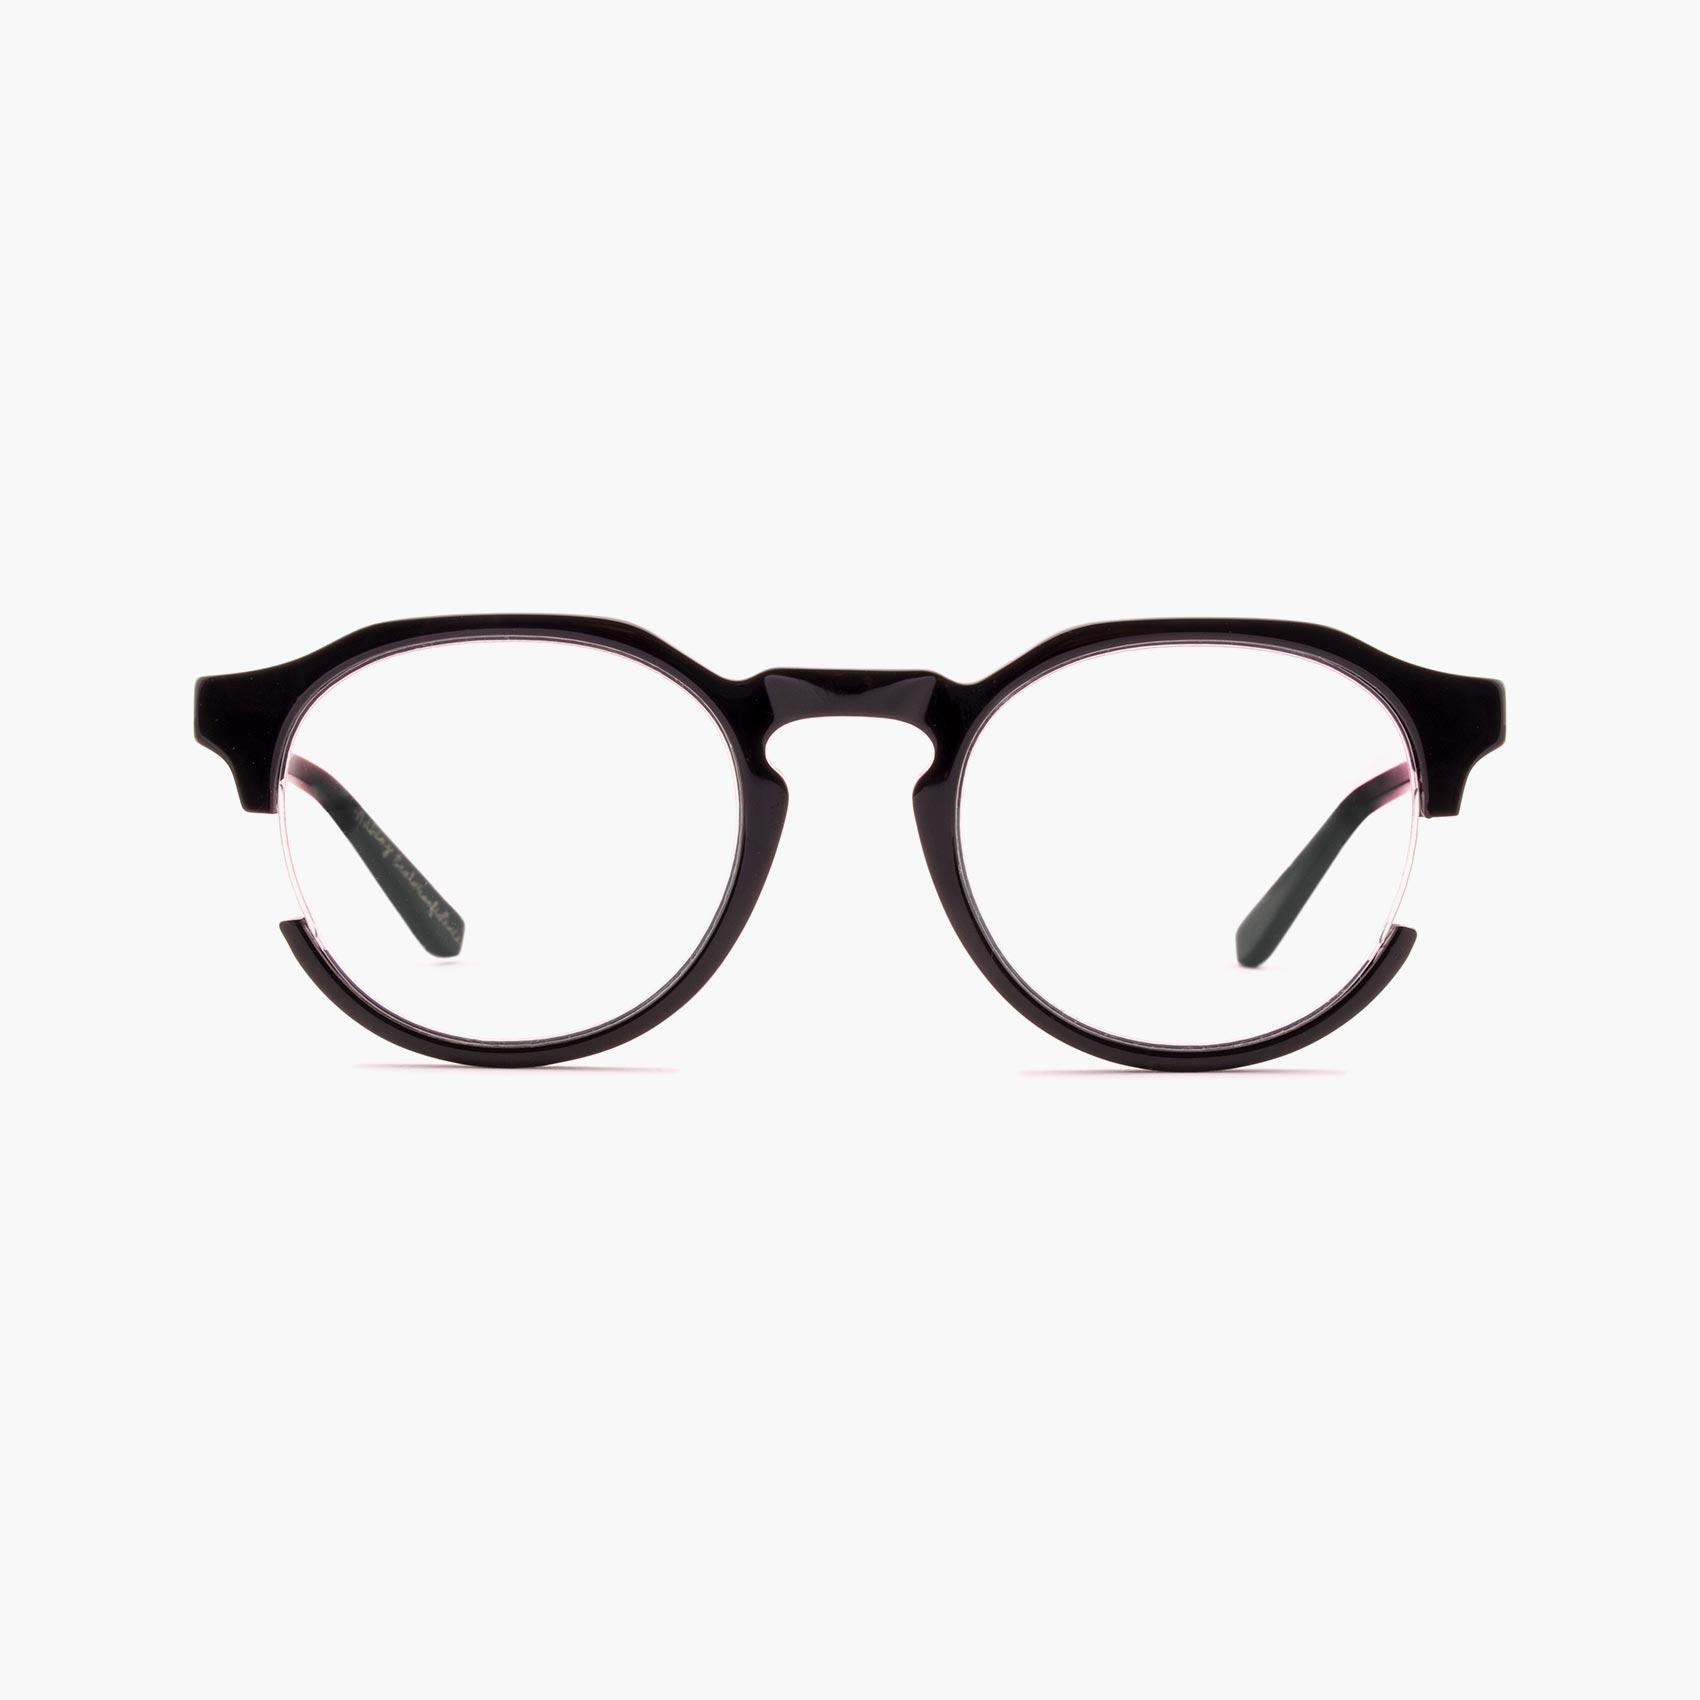 Proud eyewear Jodie C1 F gafas de acetato mujer moda